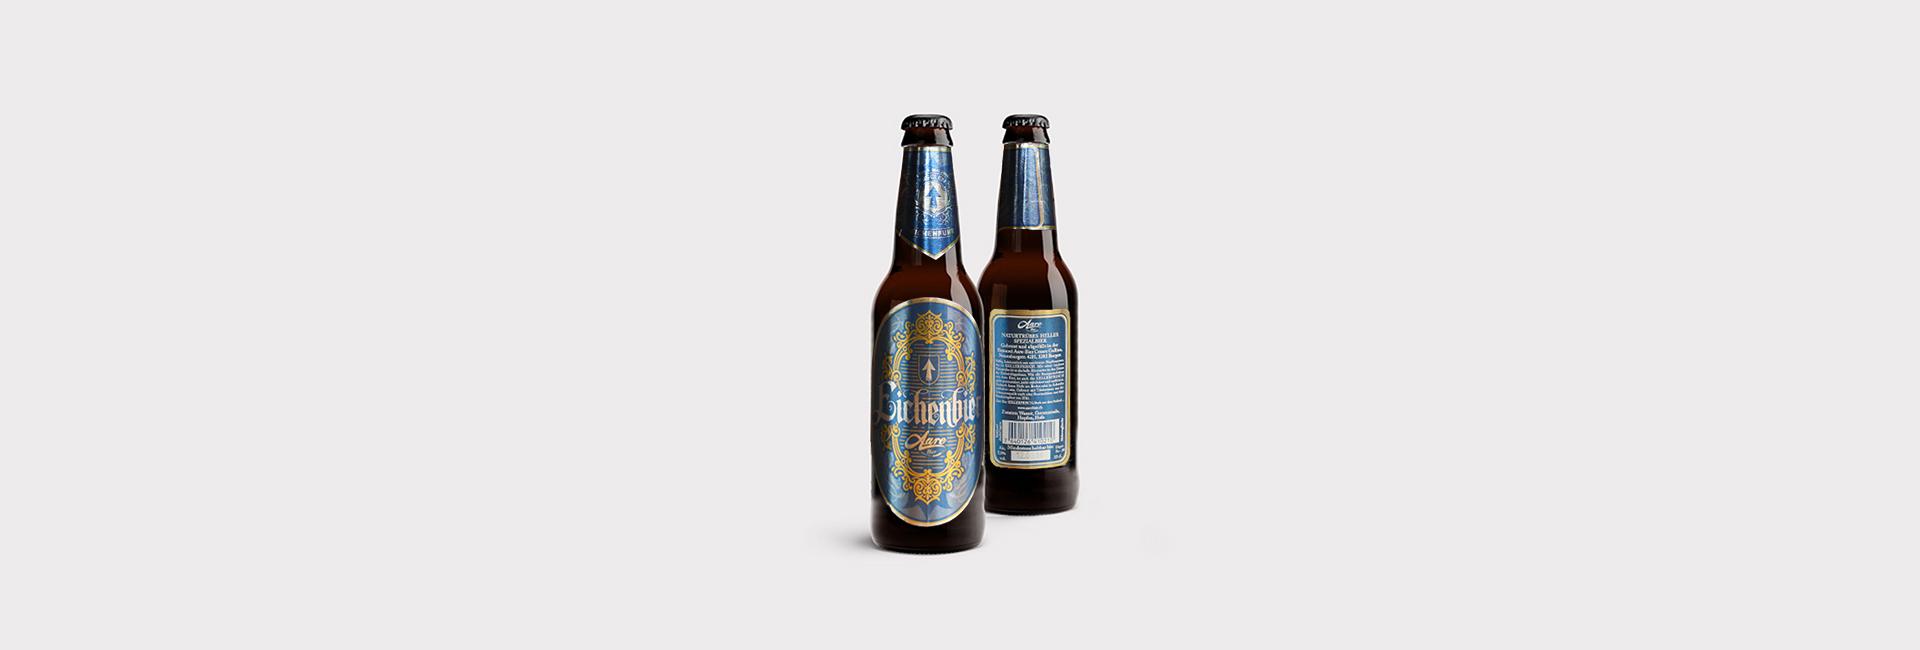 Bier Etikette